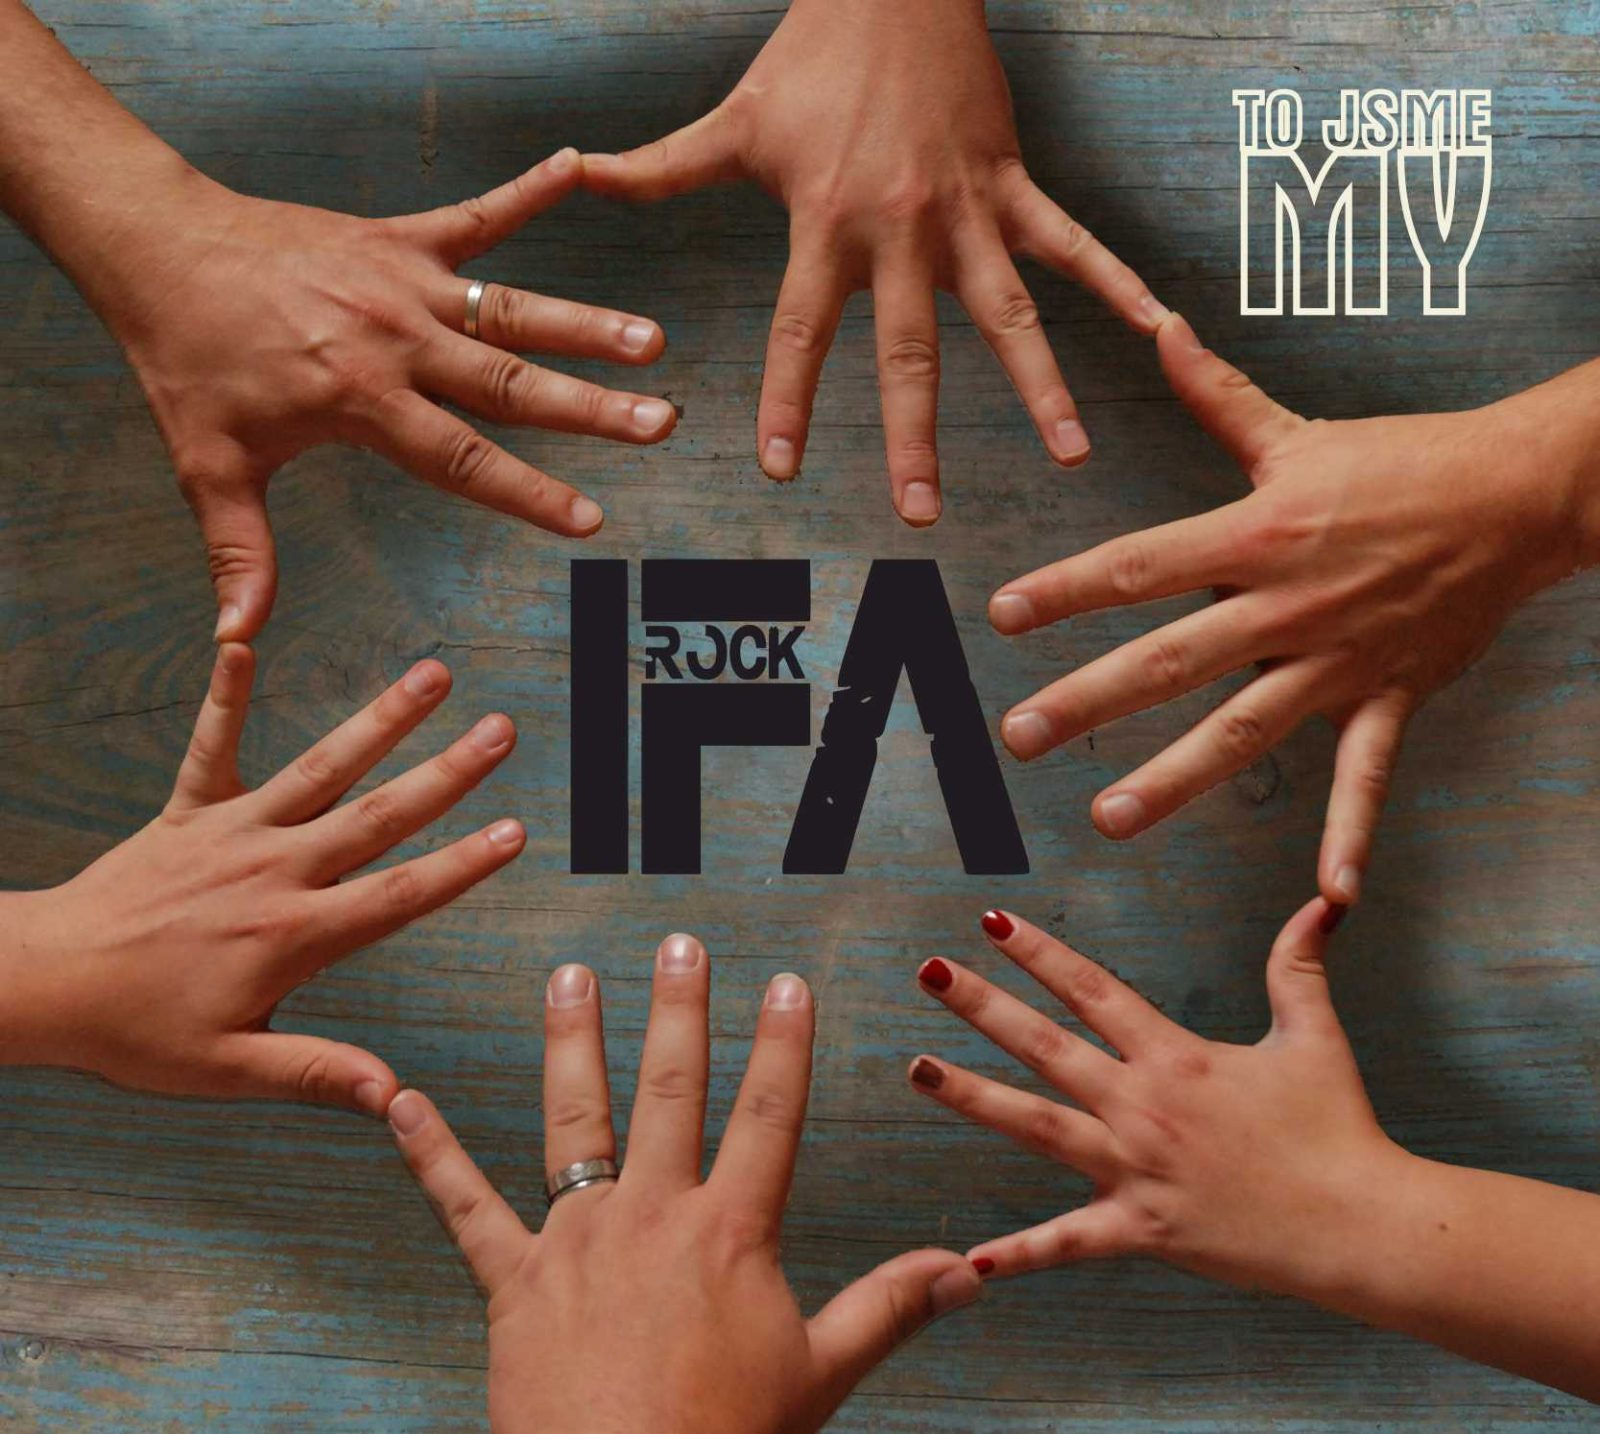 IFArock-To jsme my